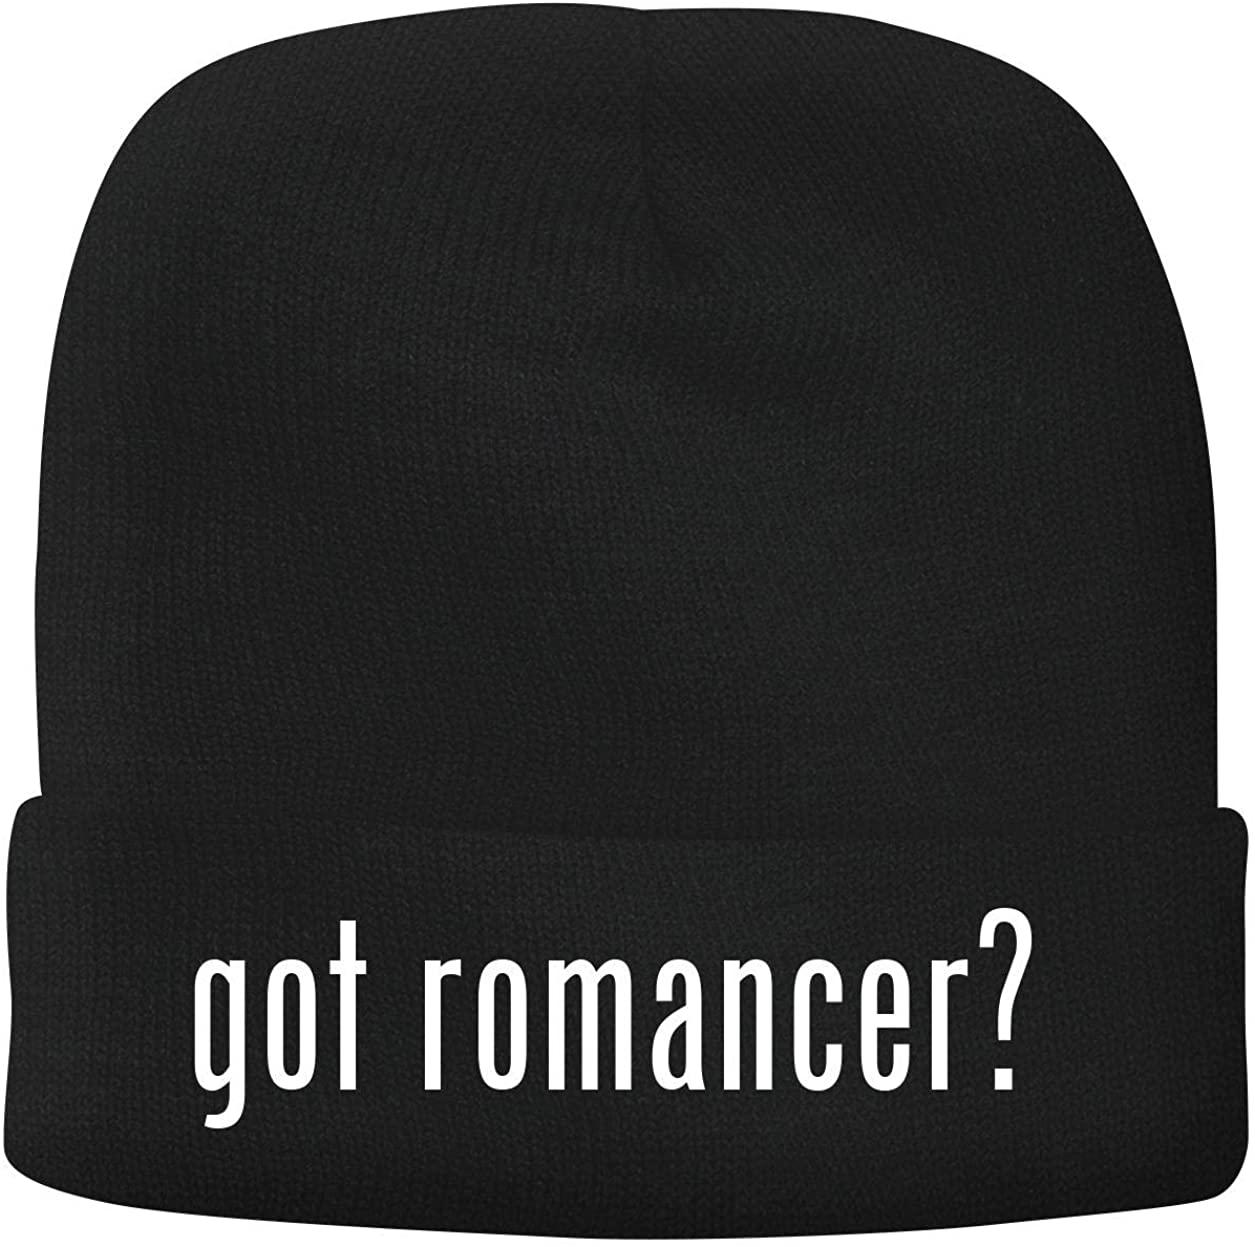 BH Cool Designs got Romancer? - Men's Soft & Comfortable Beanie Hat Cap